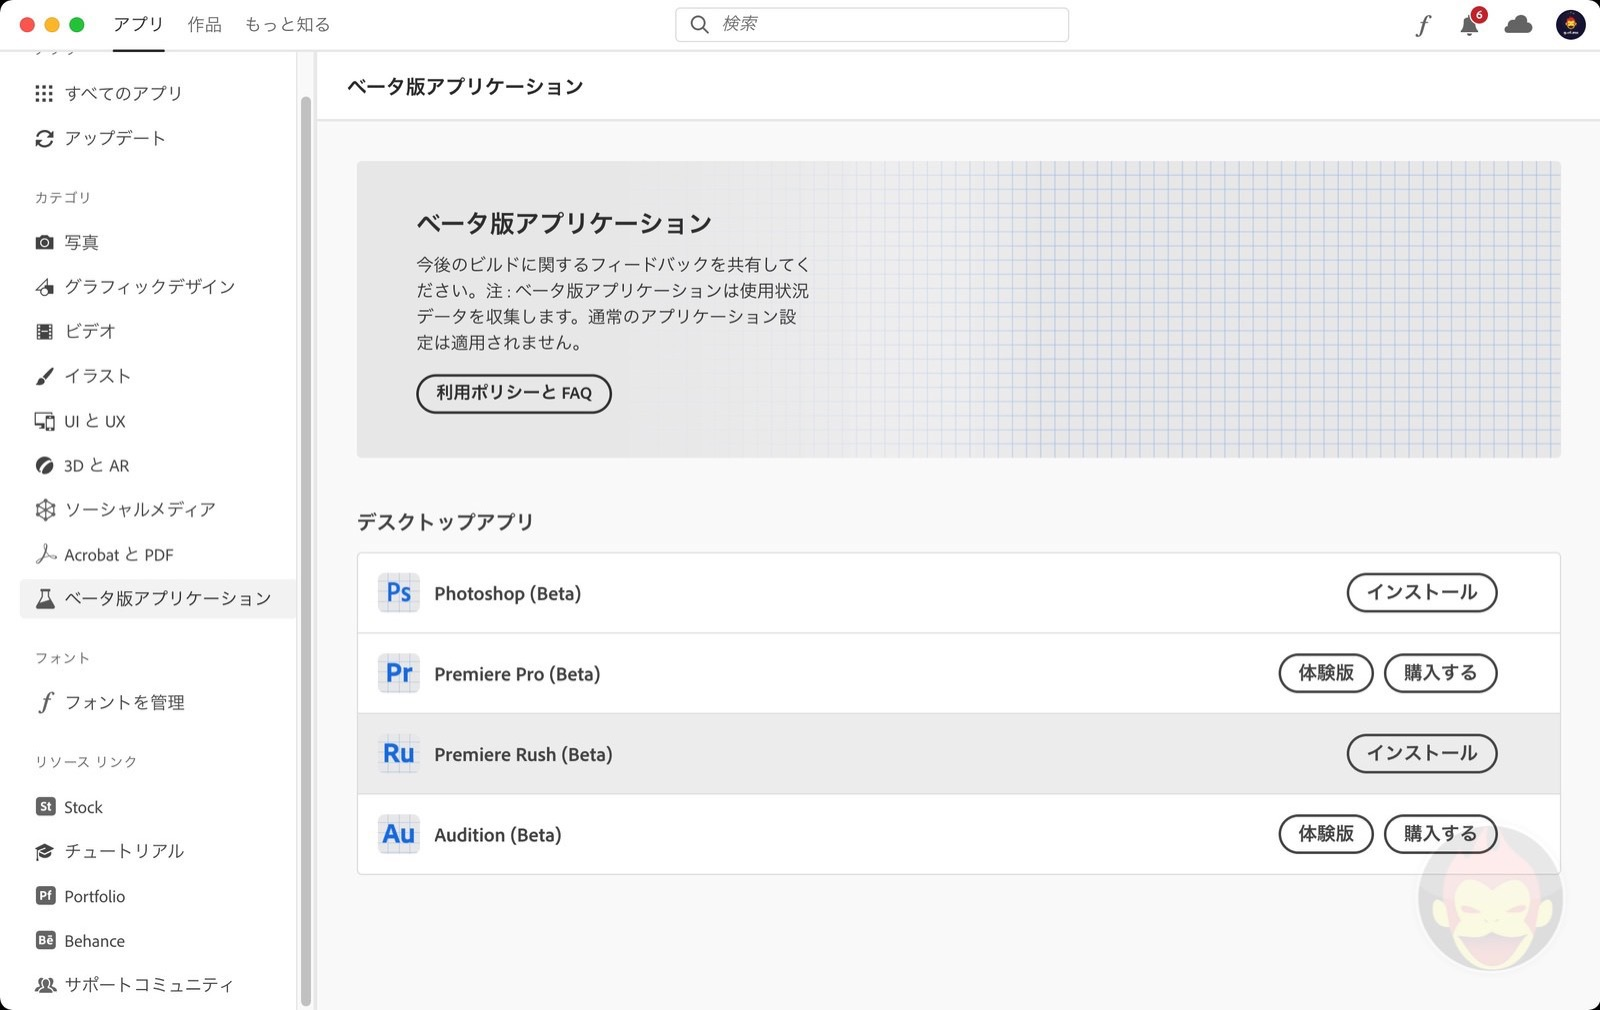 Adobe-Premiere-Pro-Rush-Audition-in-Beta-01.jpg